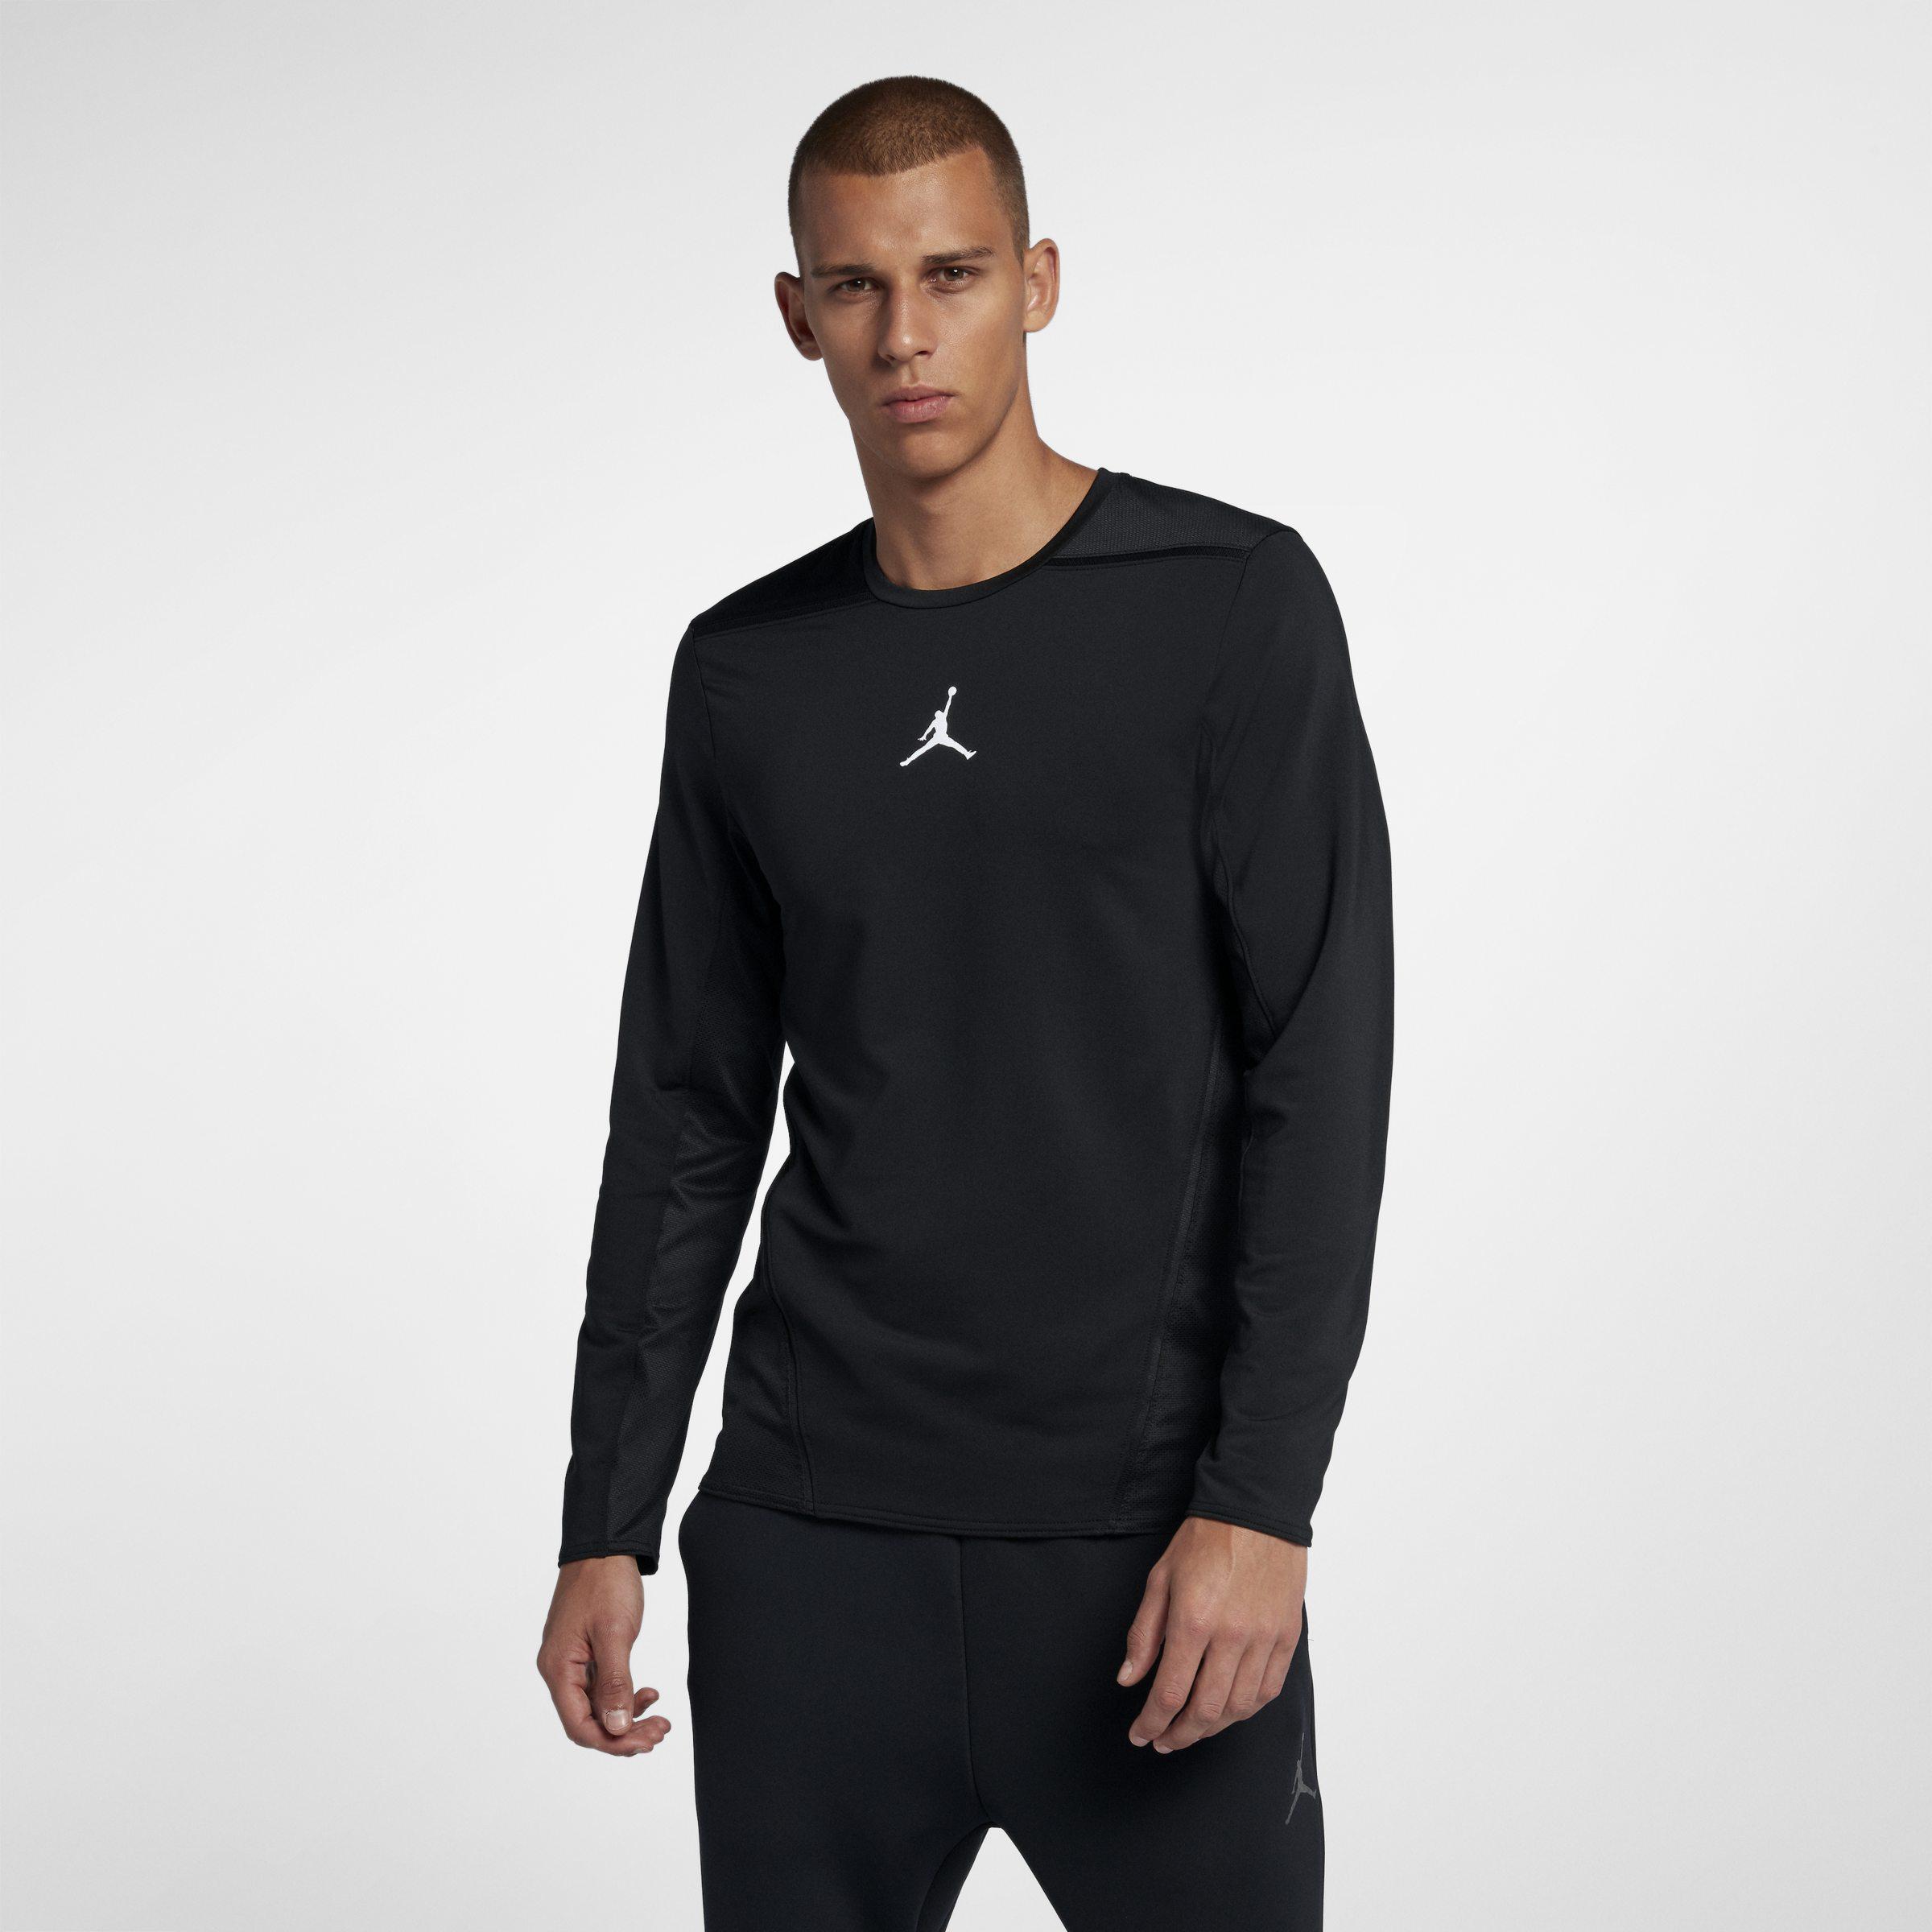 5a78b1710cbfde Nike Jordan Ultimate Flight Basketball Shooting Top in Black for Men ...